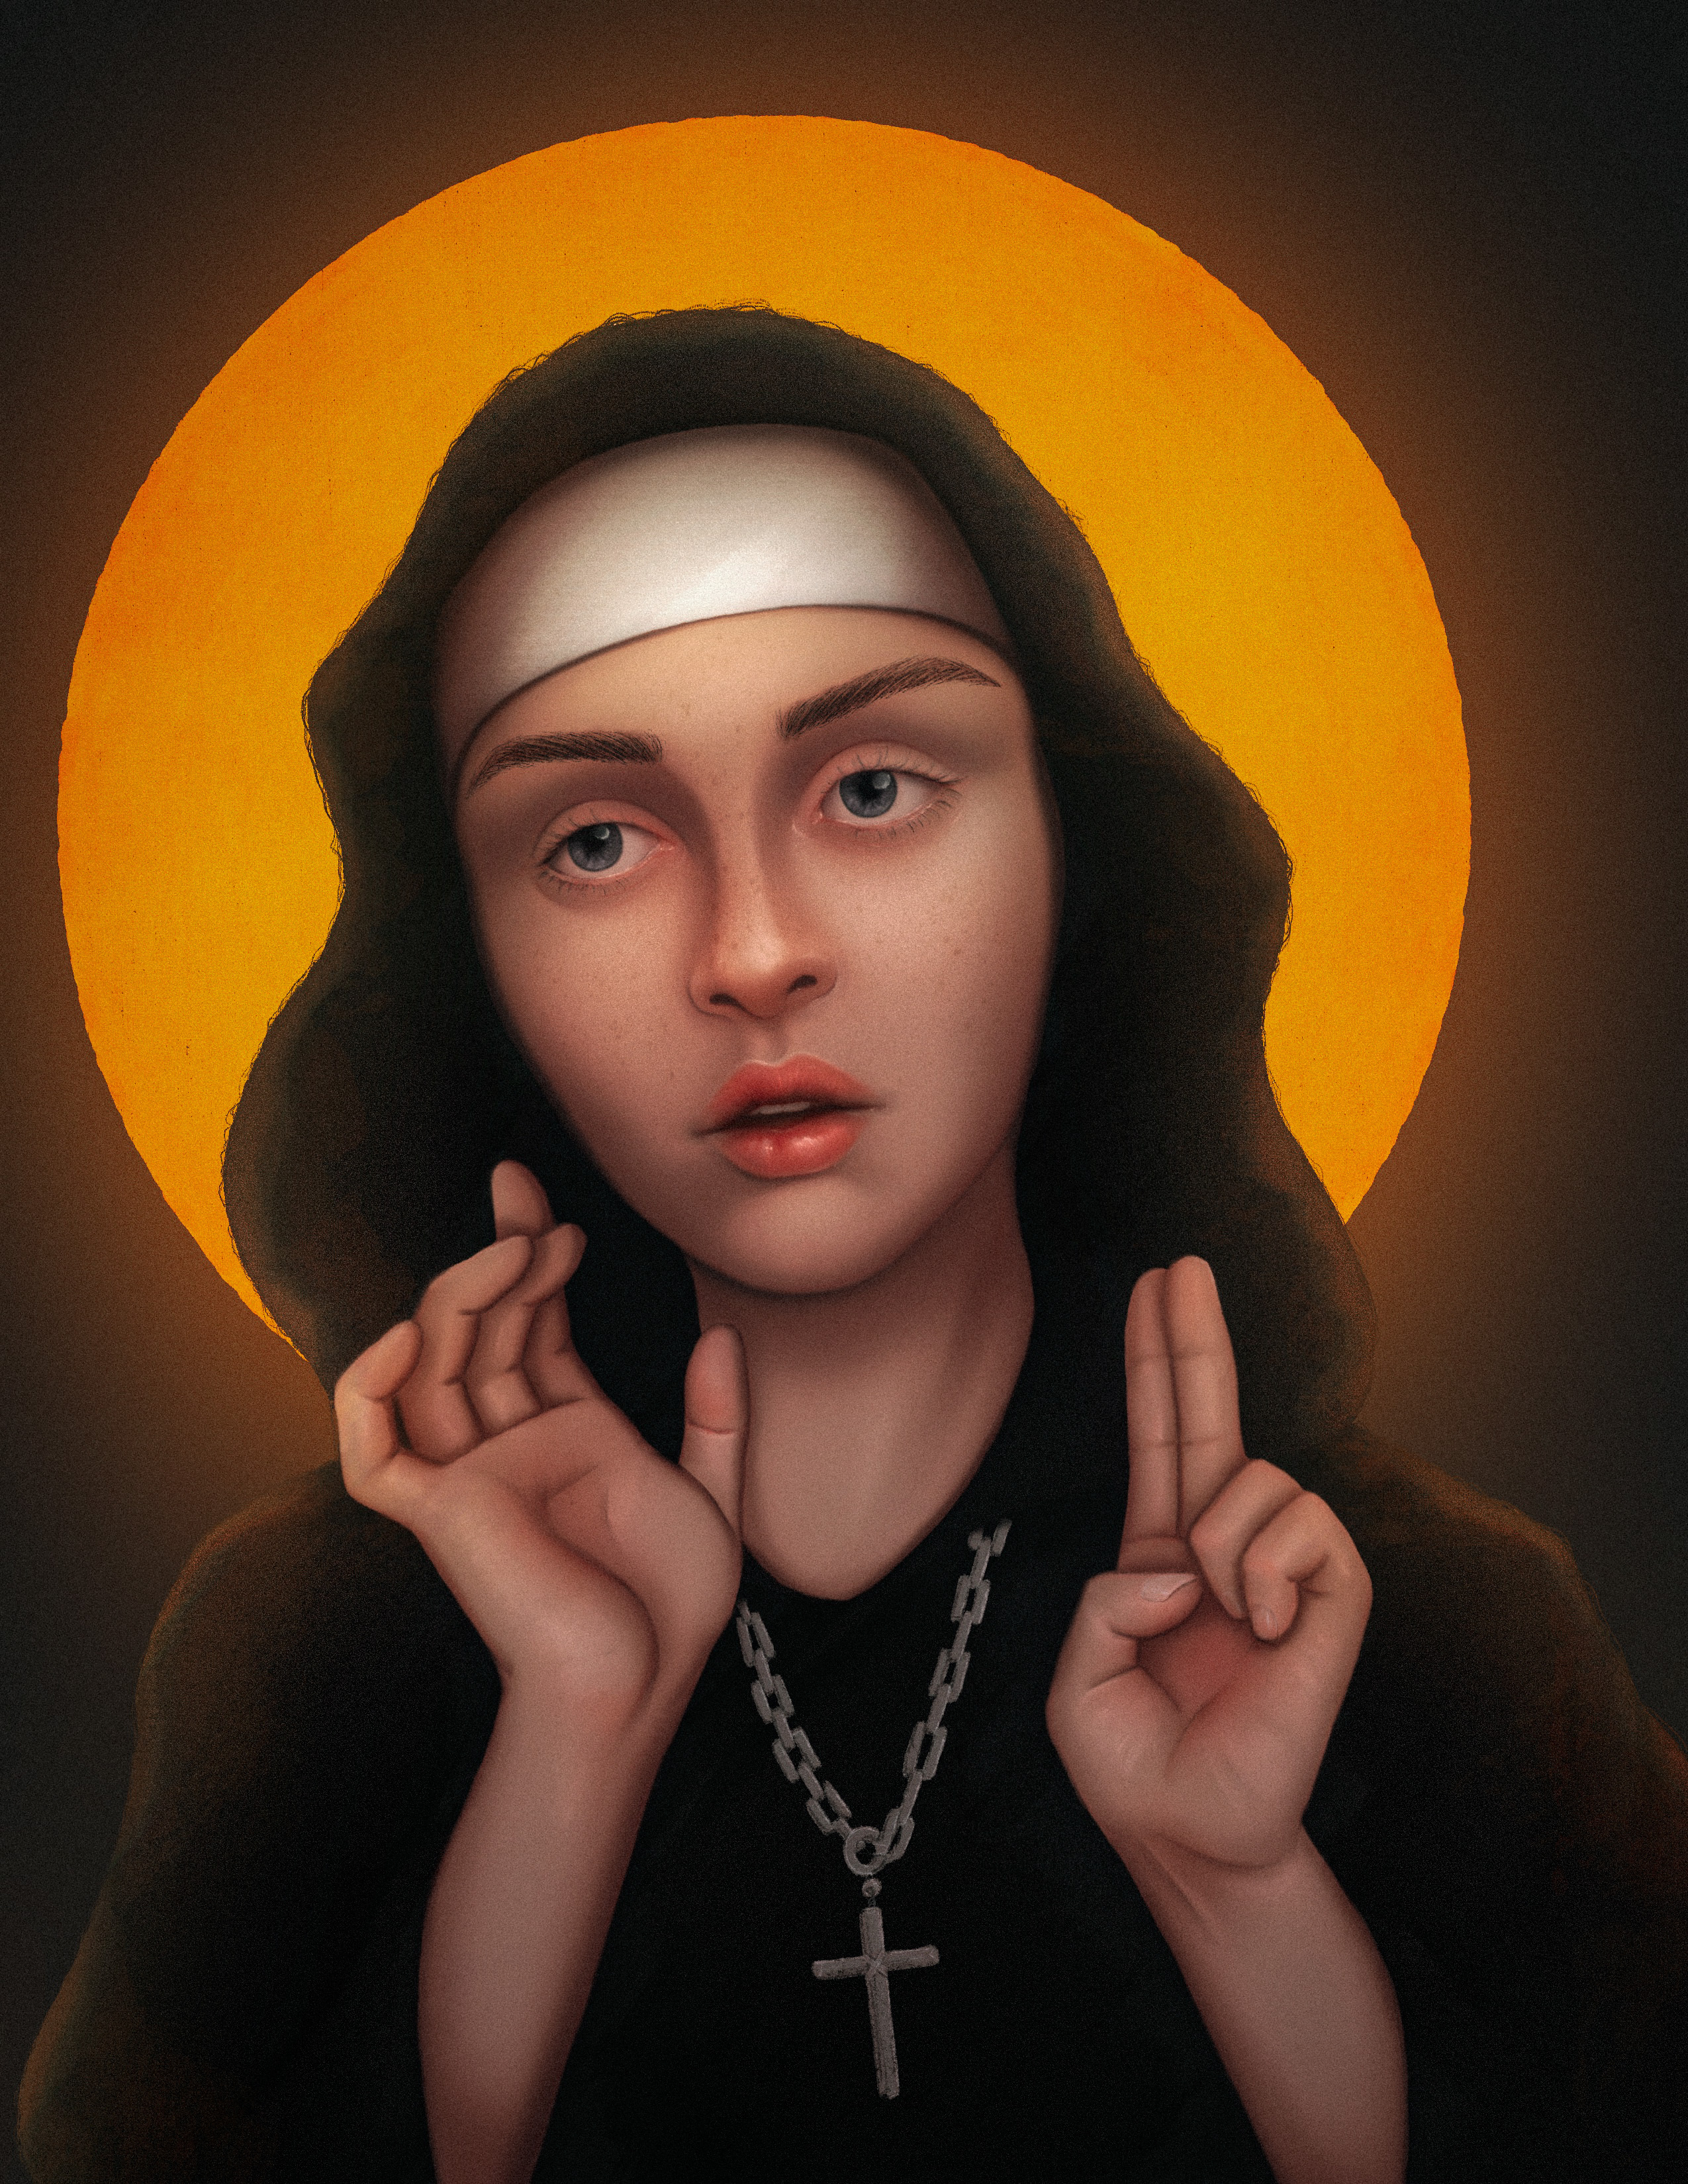 Time Warp Nun